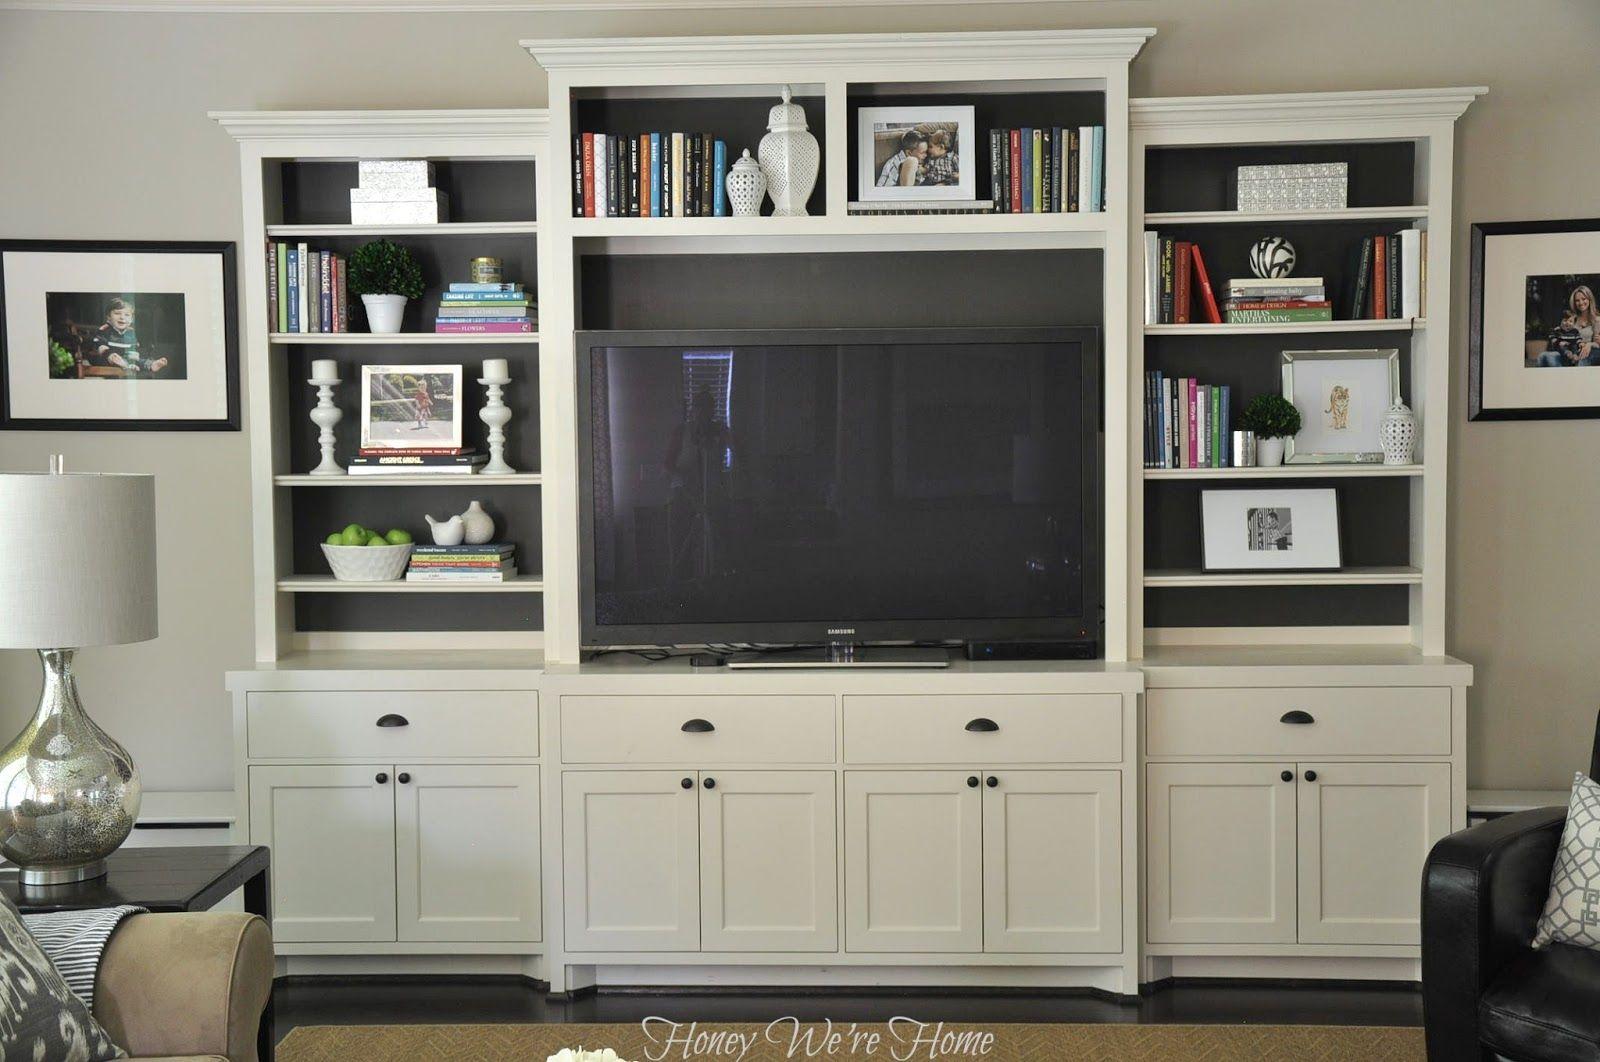 Painted Media Cabinet Bookshelf Styling Living Room Built Ins